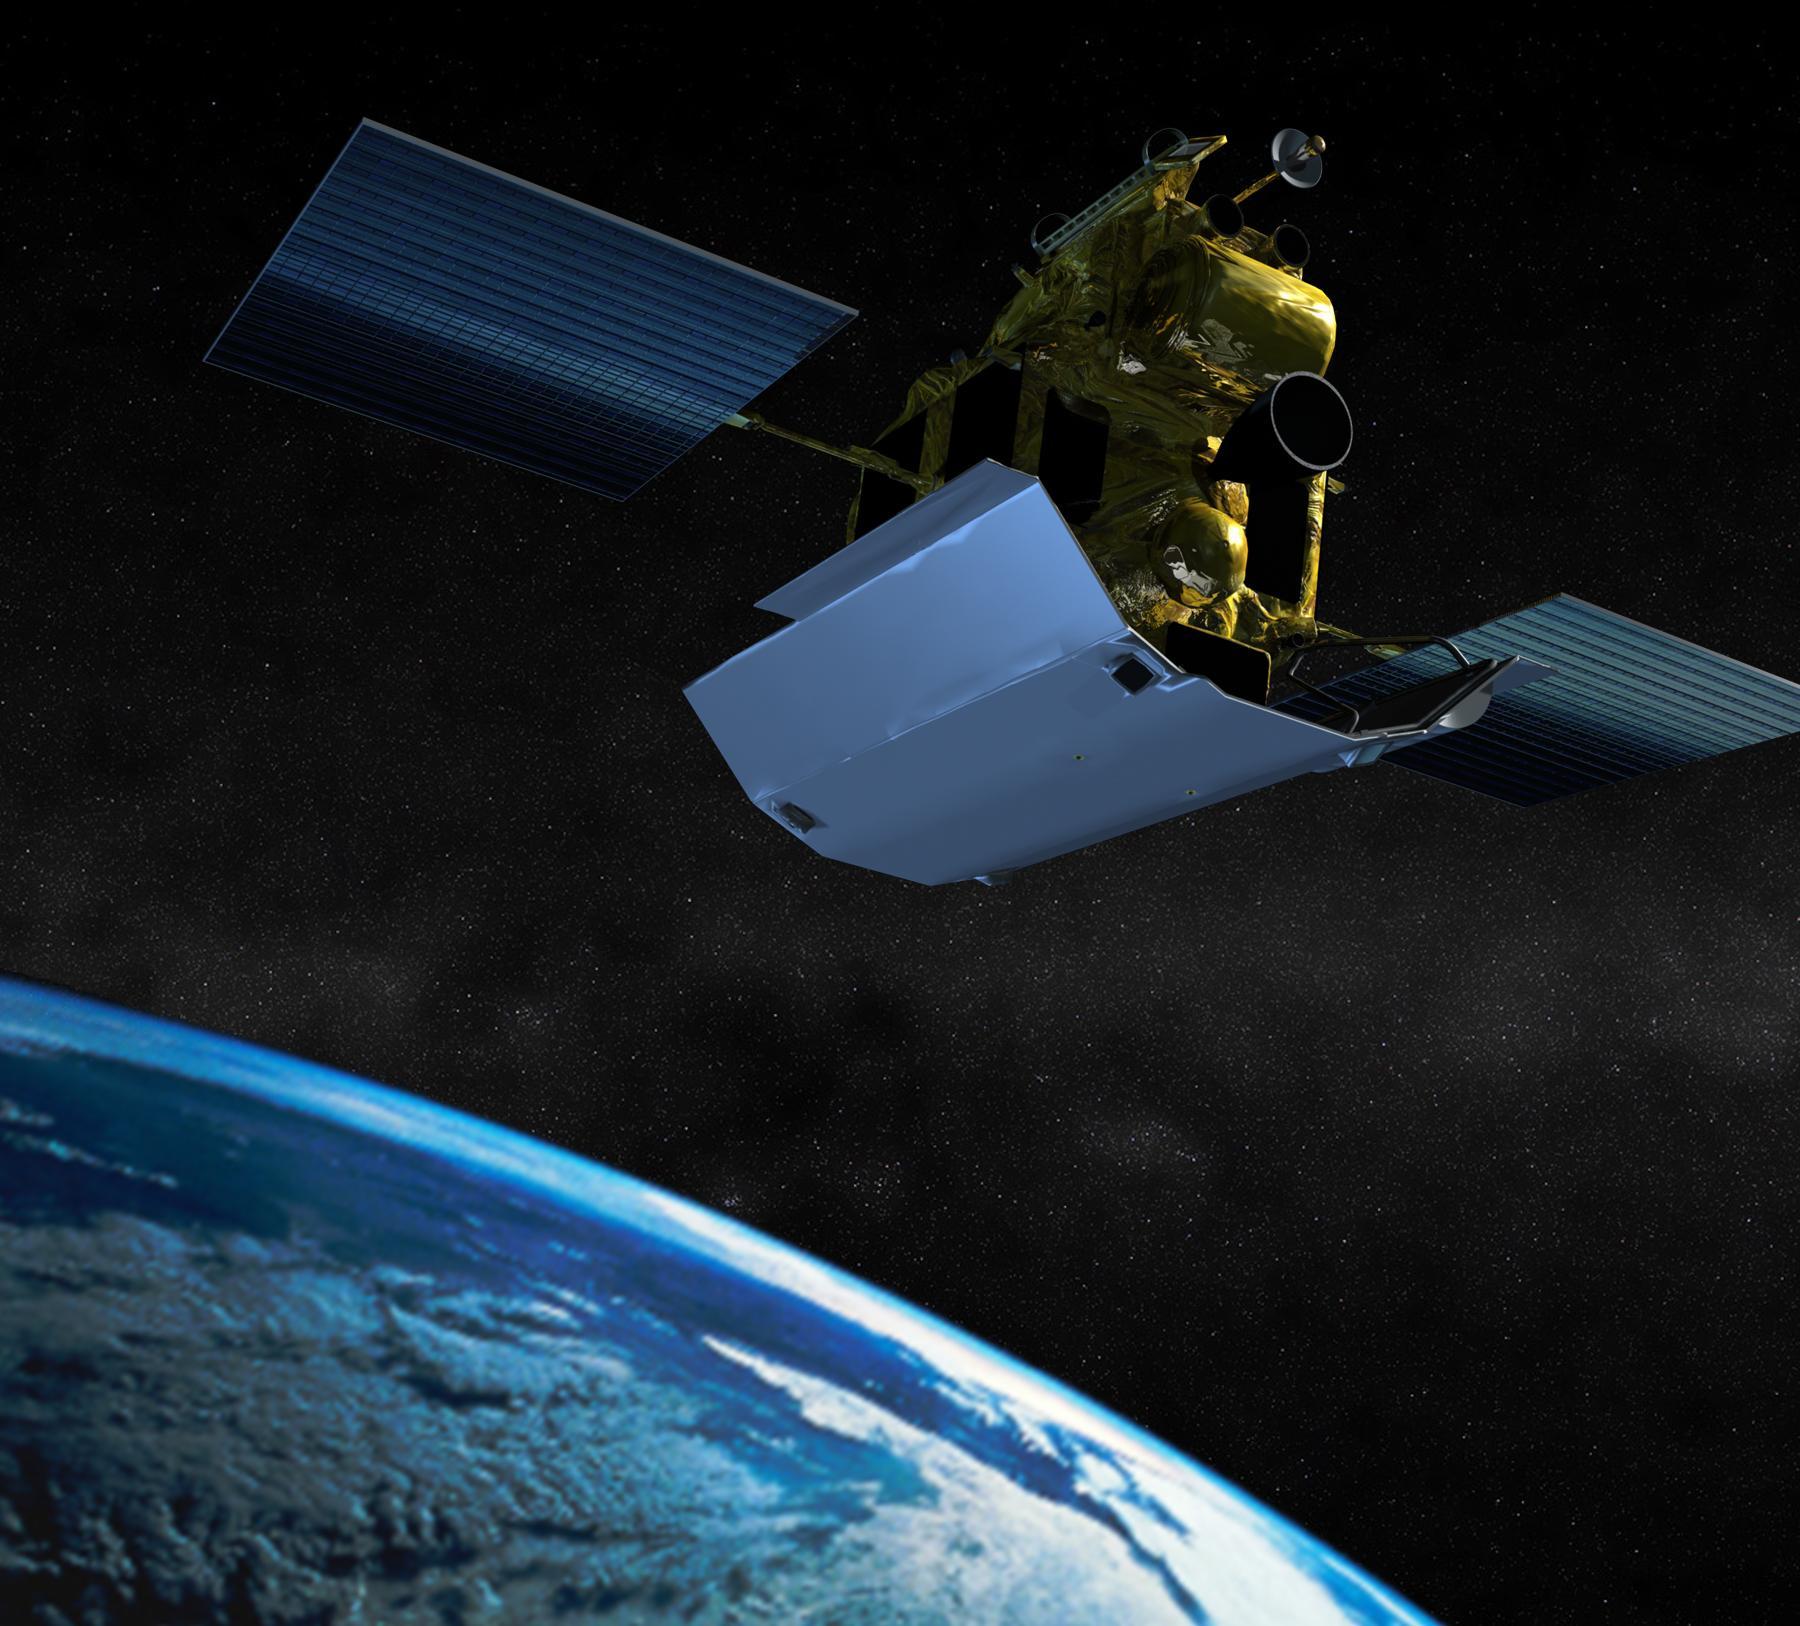 messenger spacecraft discoveries - HD1550×1400